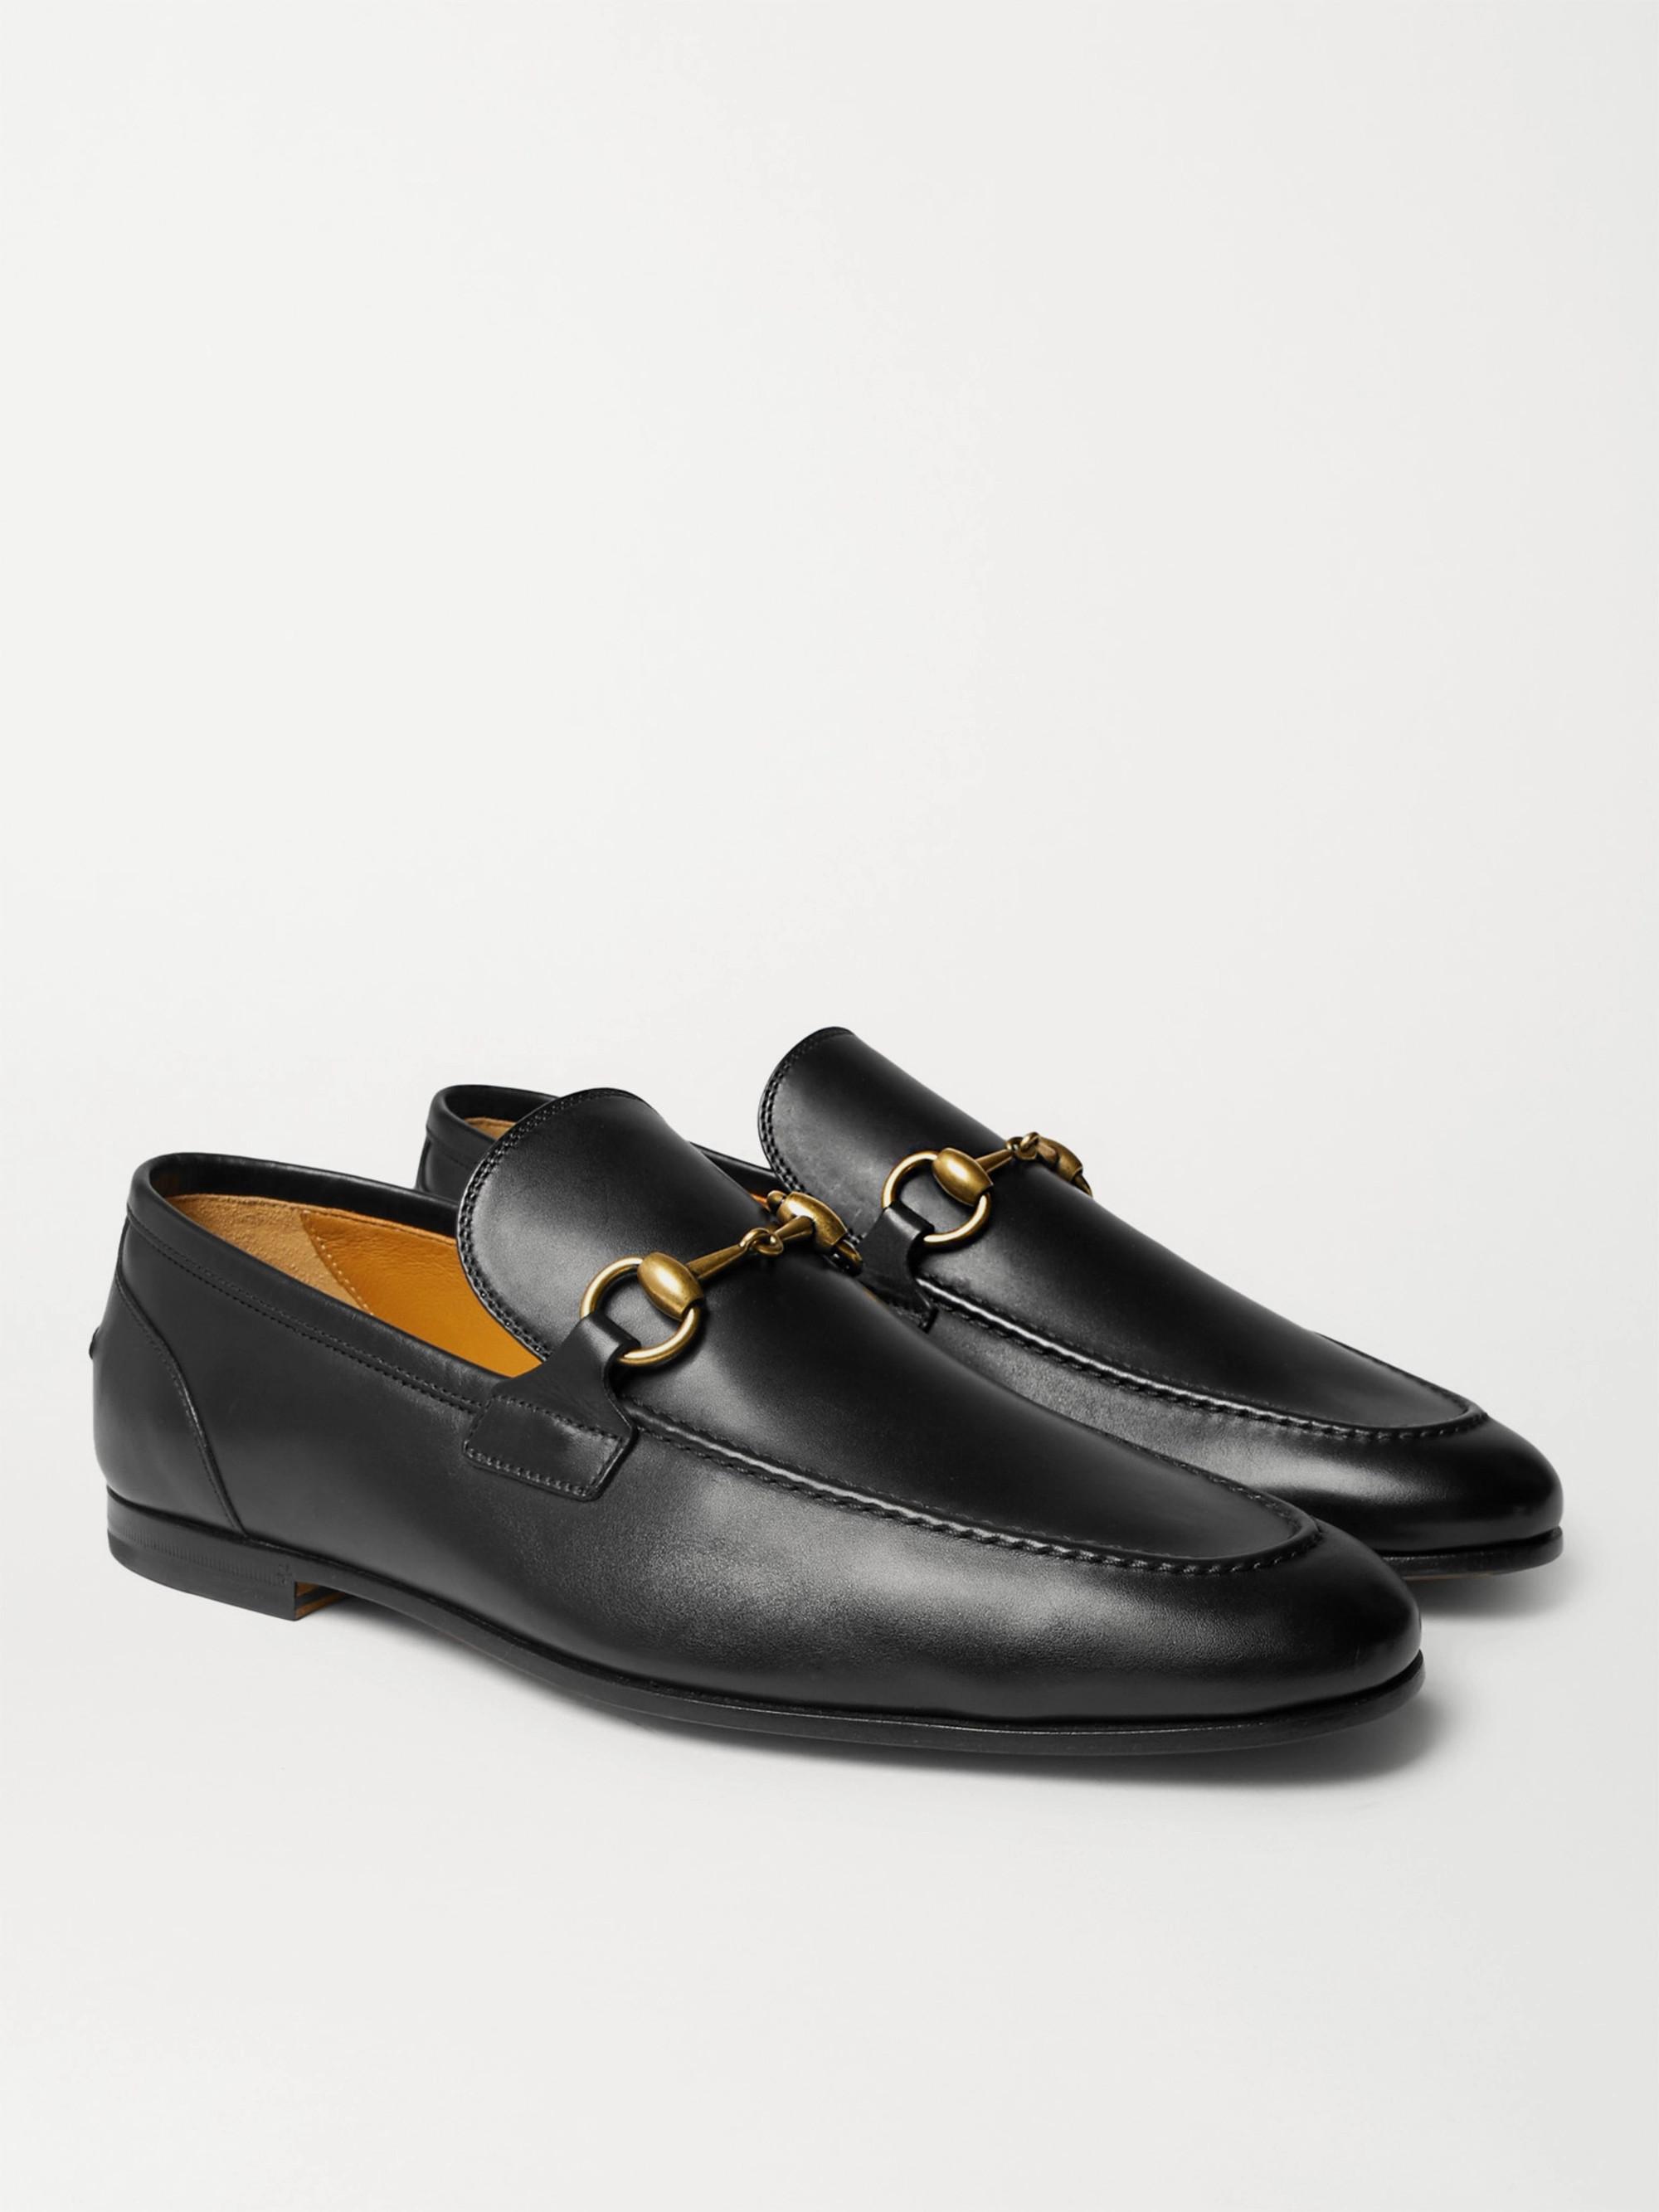 53193c07d Shoes for Men | Designer Sportswear | MR PORTER